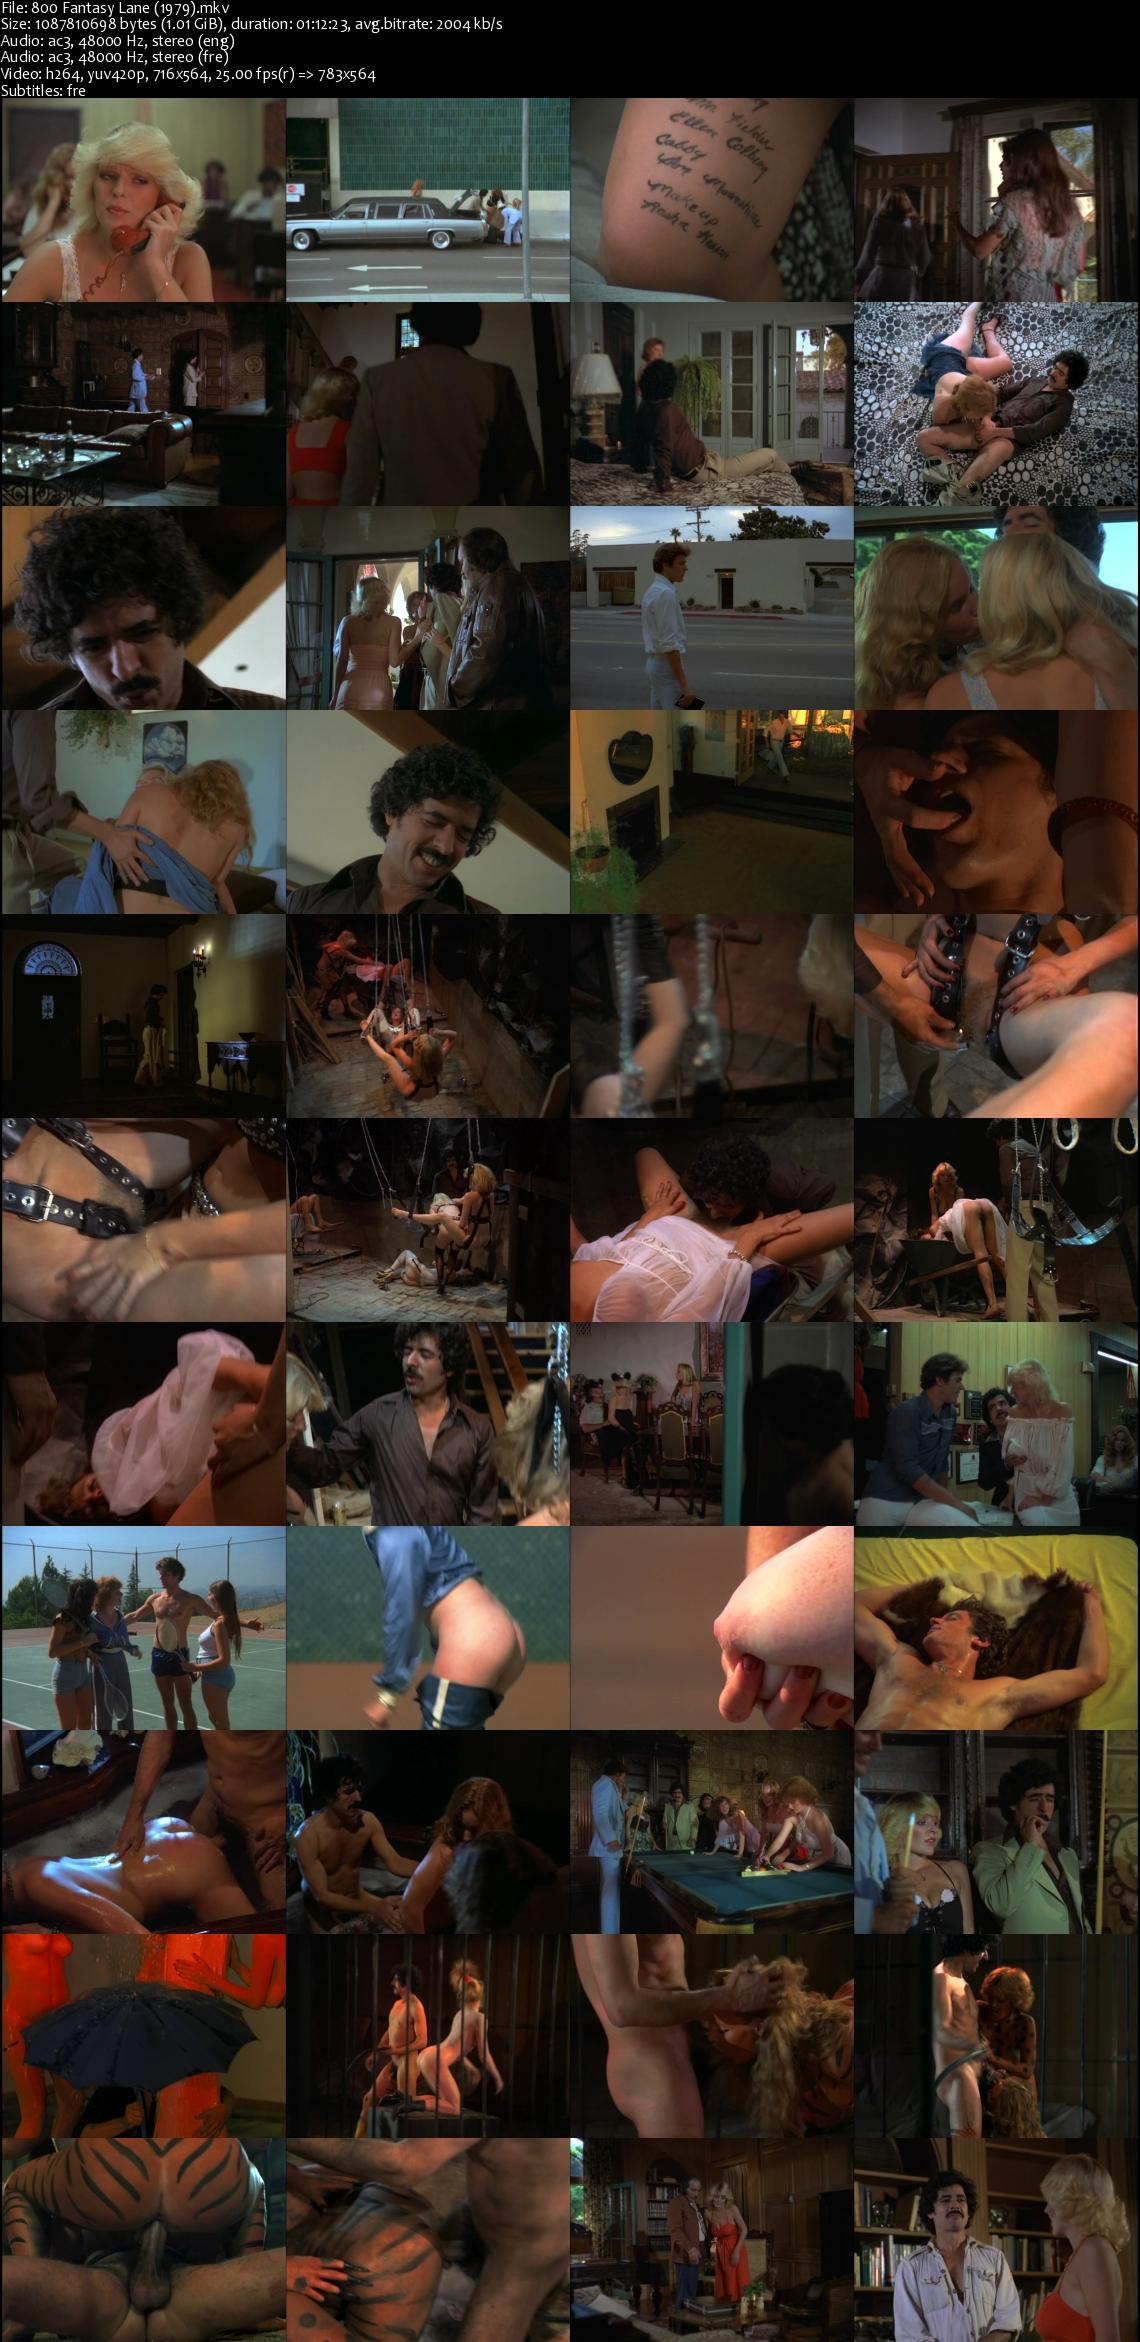 Lisa de leeuw hollywood starmovie - 5 3